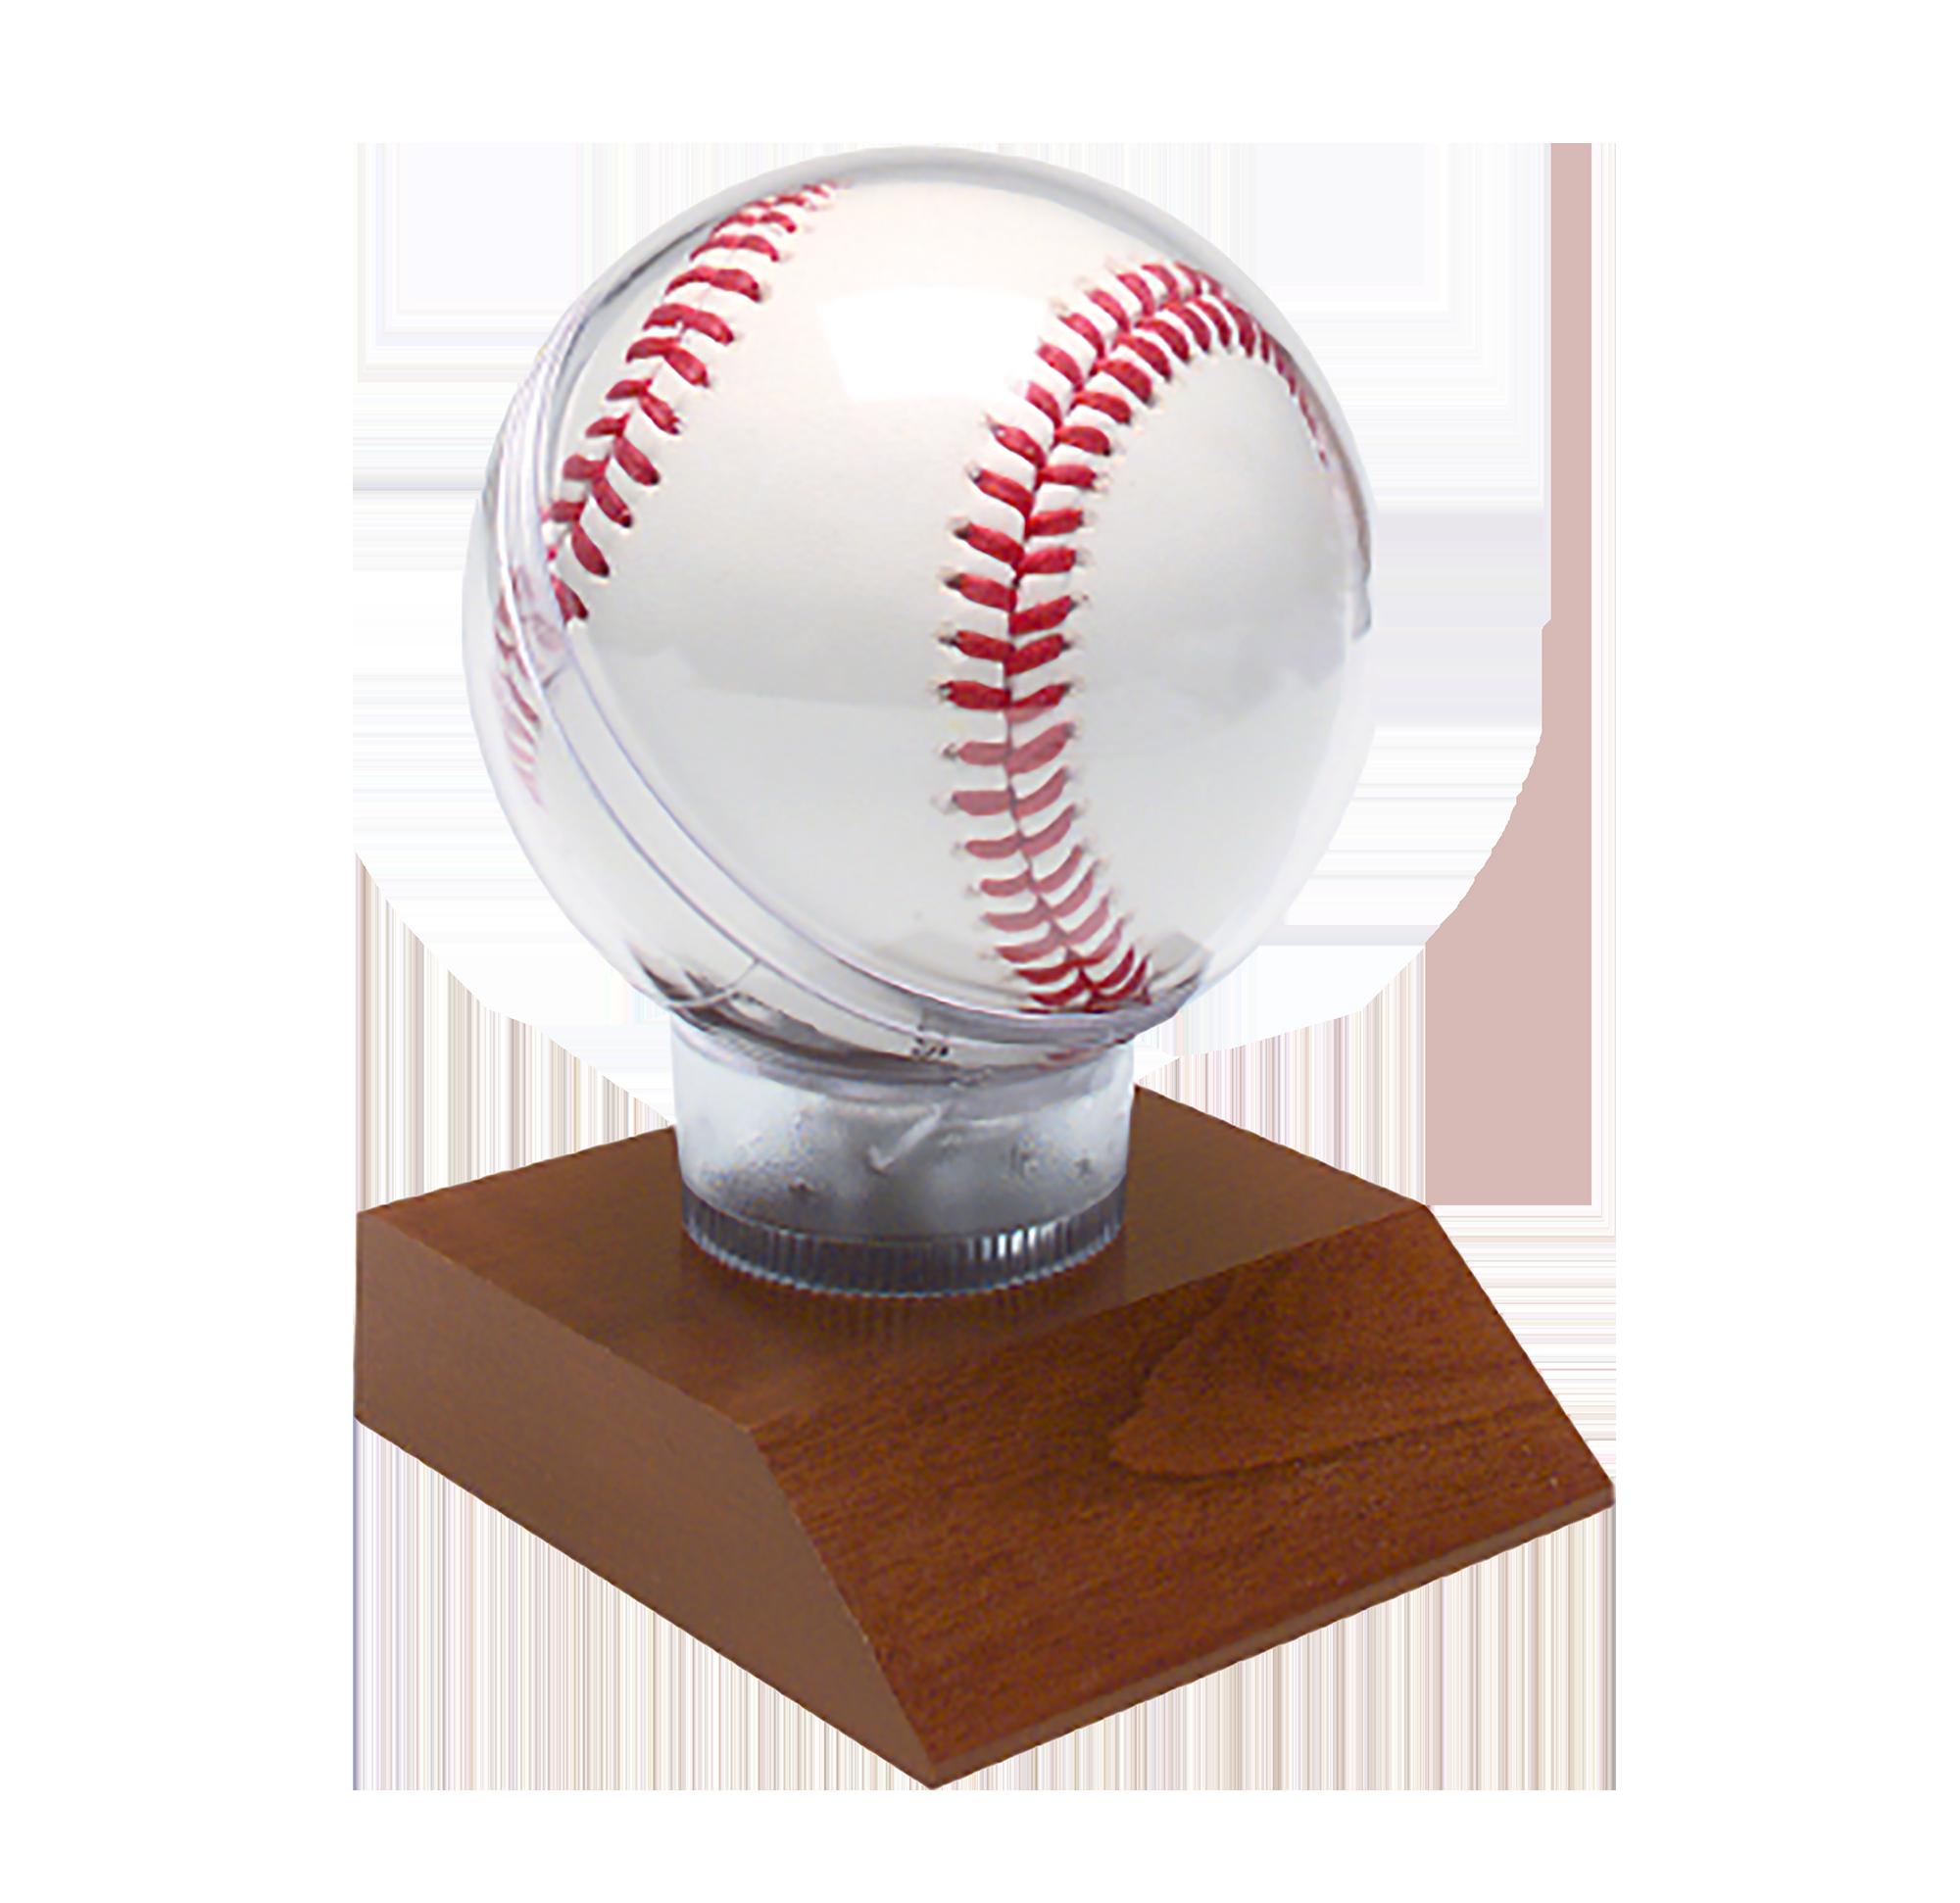 Personalized Baseball Trophy Award